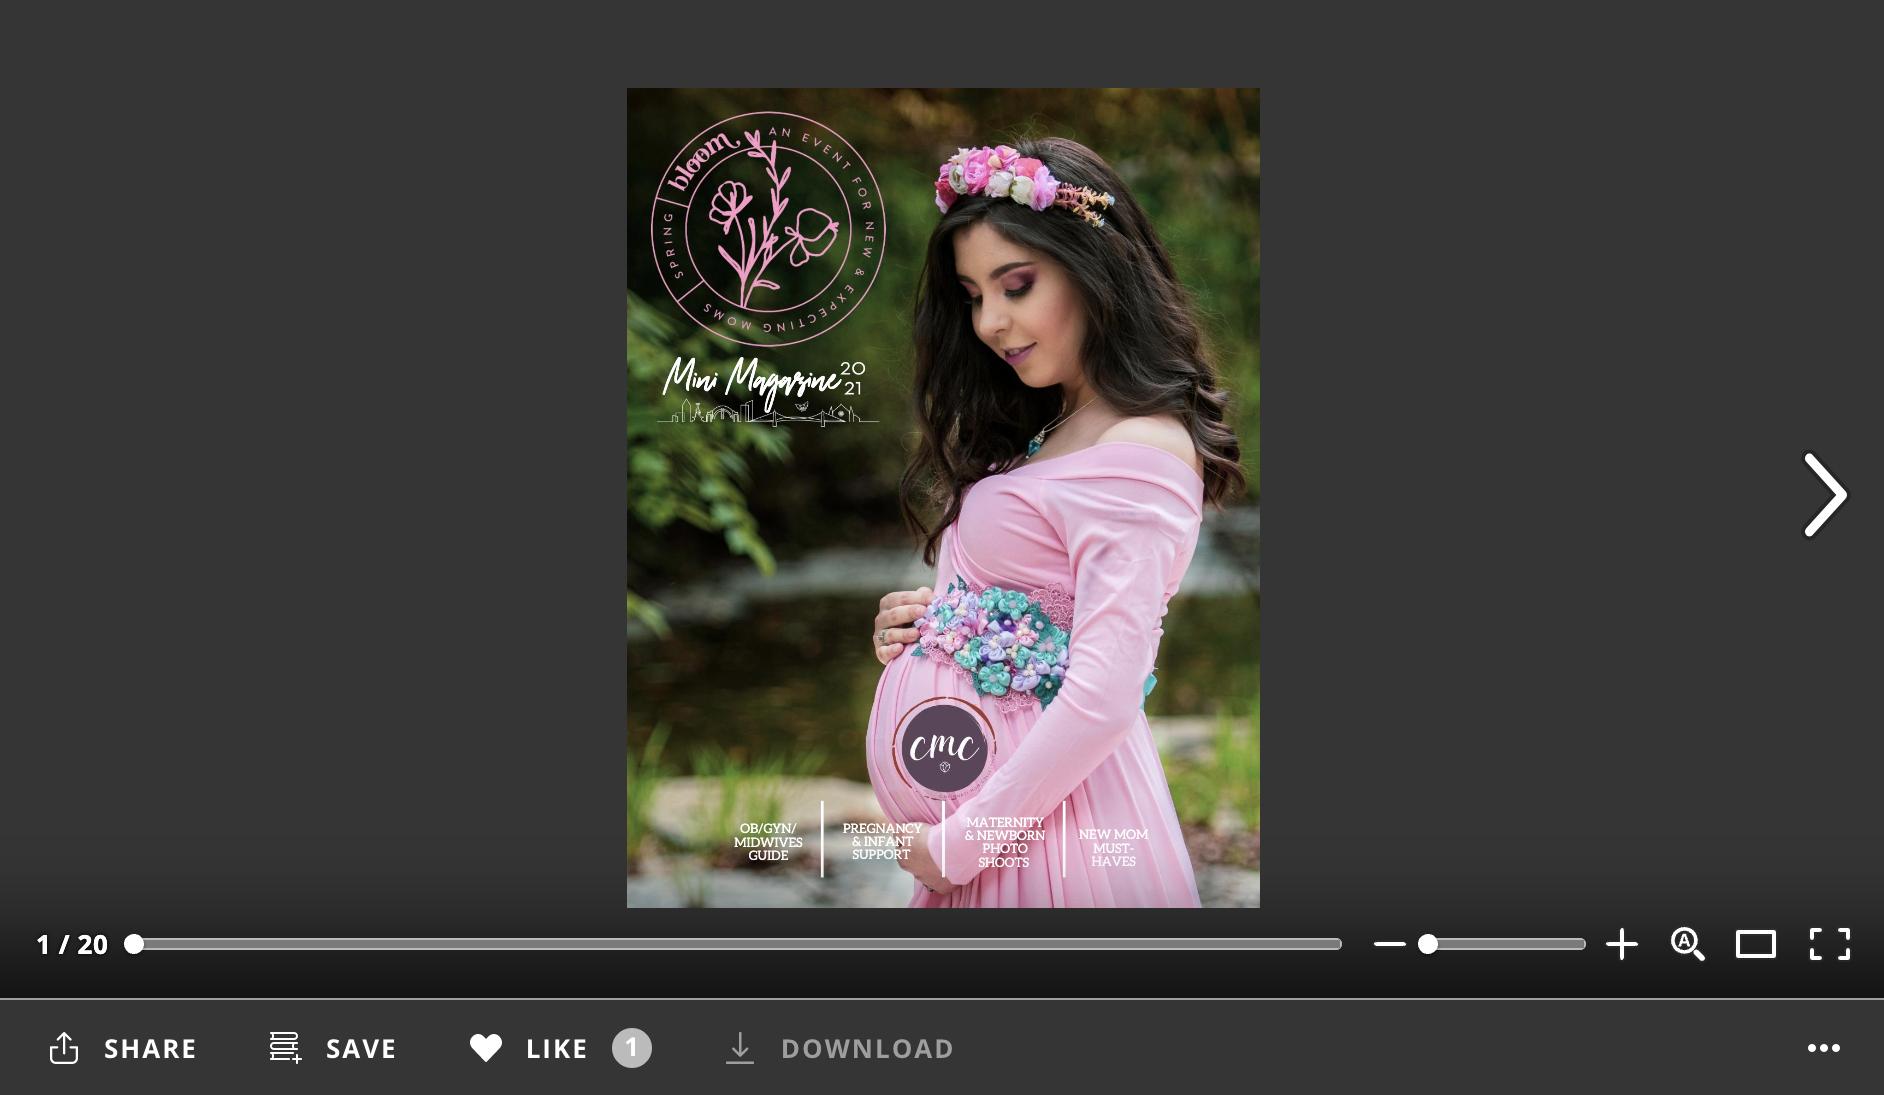 cmc bloom spring 2021 mini magazine